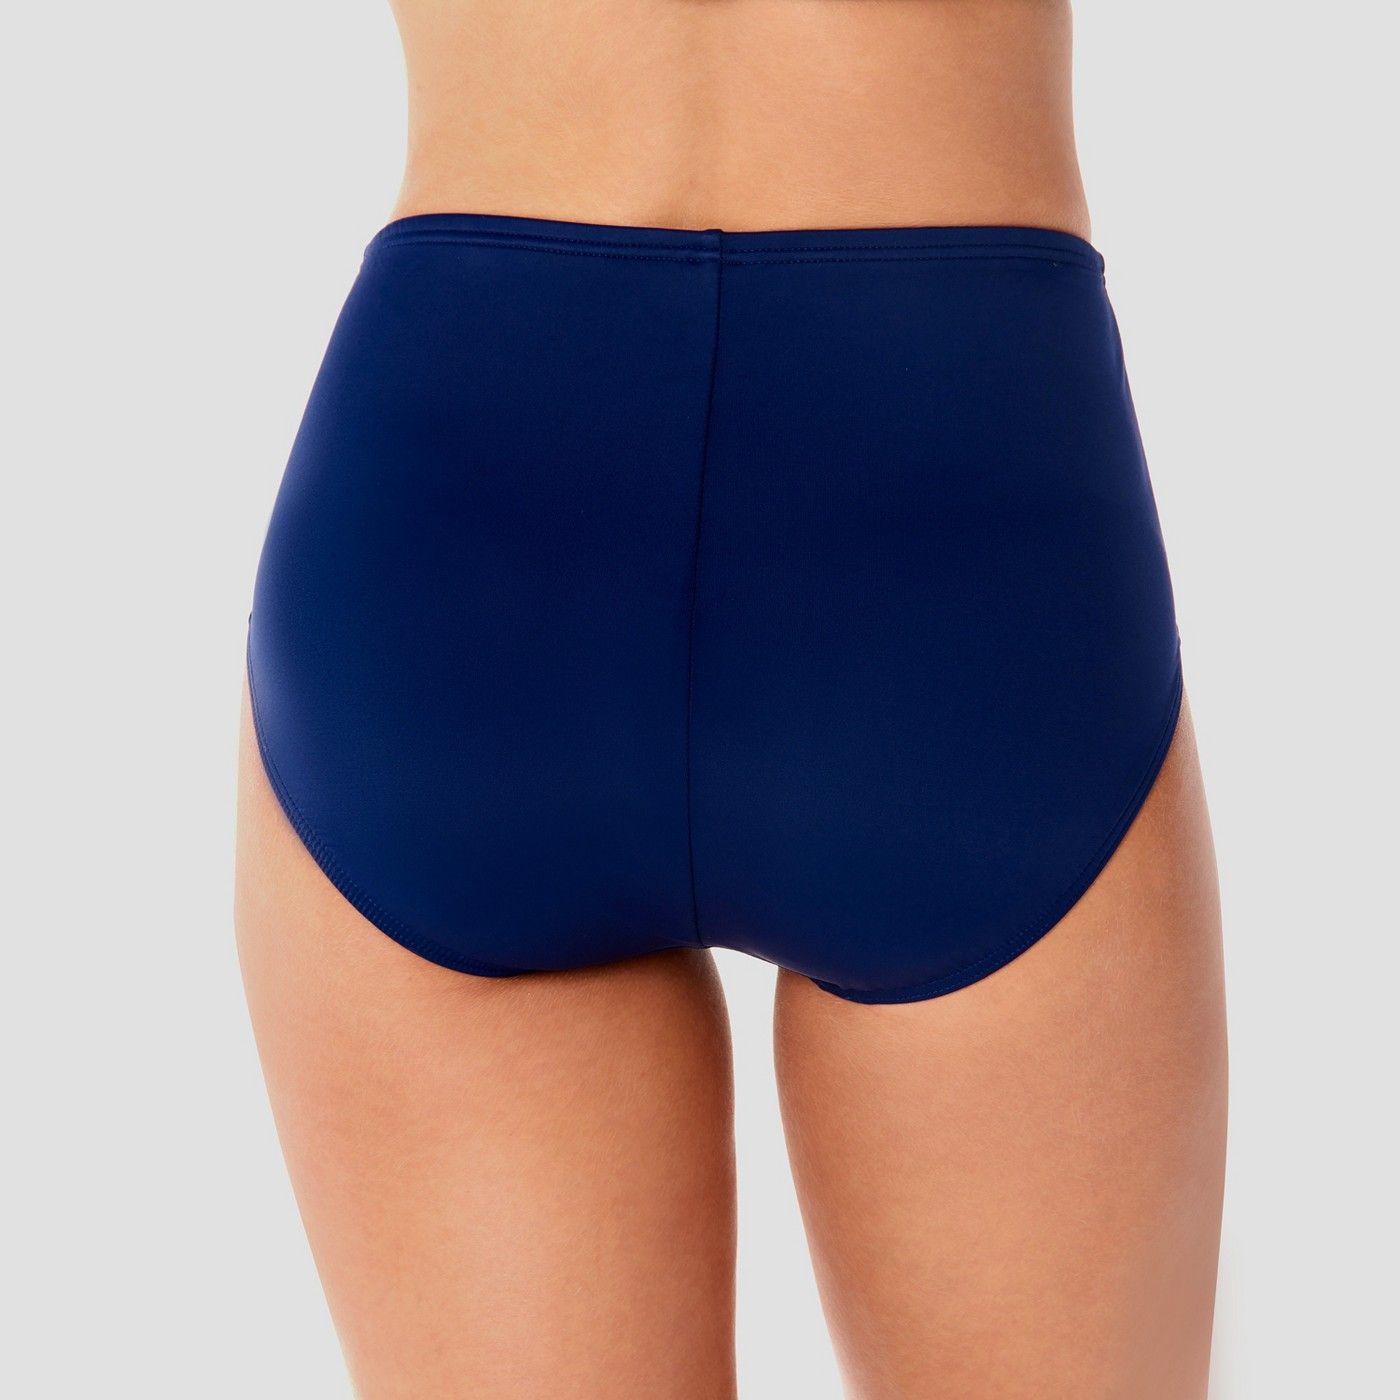 49519f5ffa Dreamsuit by Miracle Brands Women s Slimming Control High Waist Bikini  Bottom - Black 6  Women